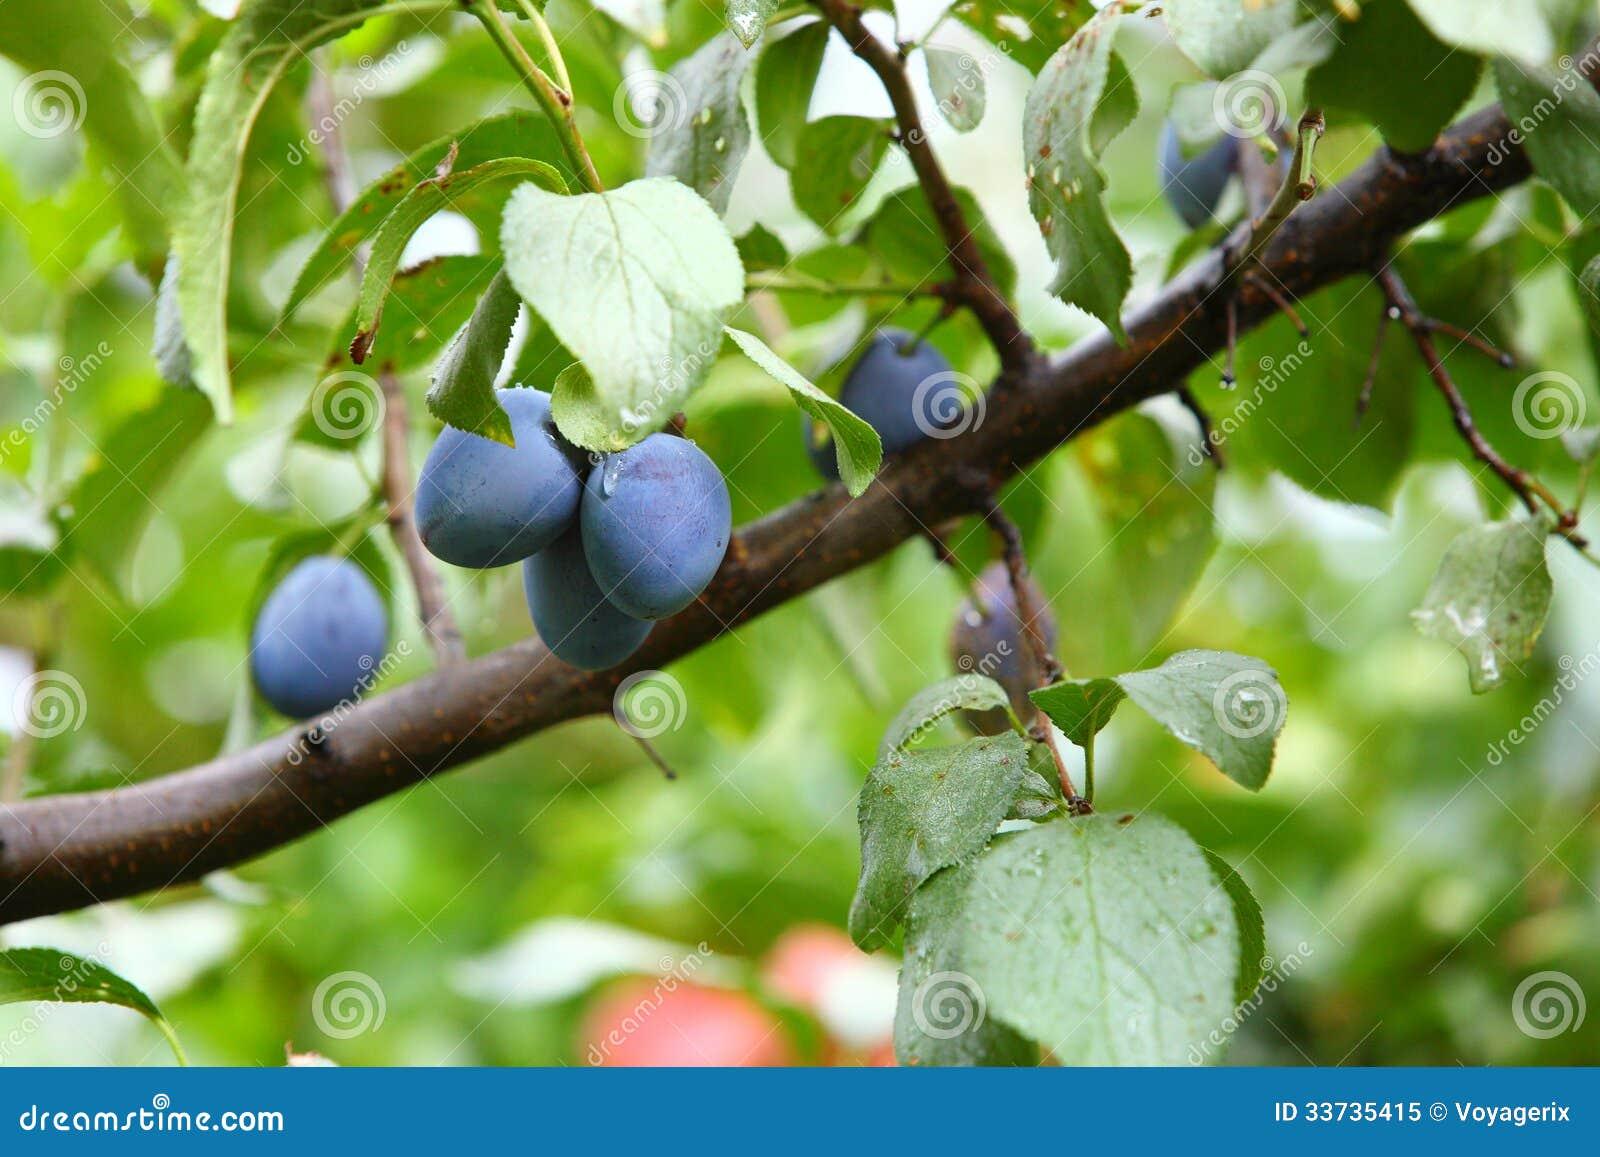 Зрелая фиолетовая слива на ветви